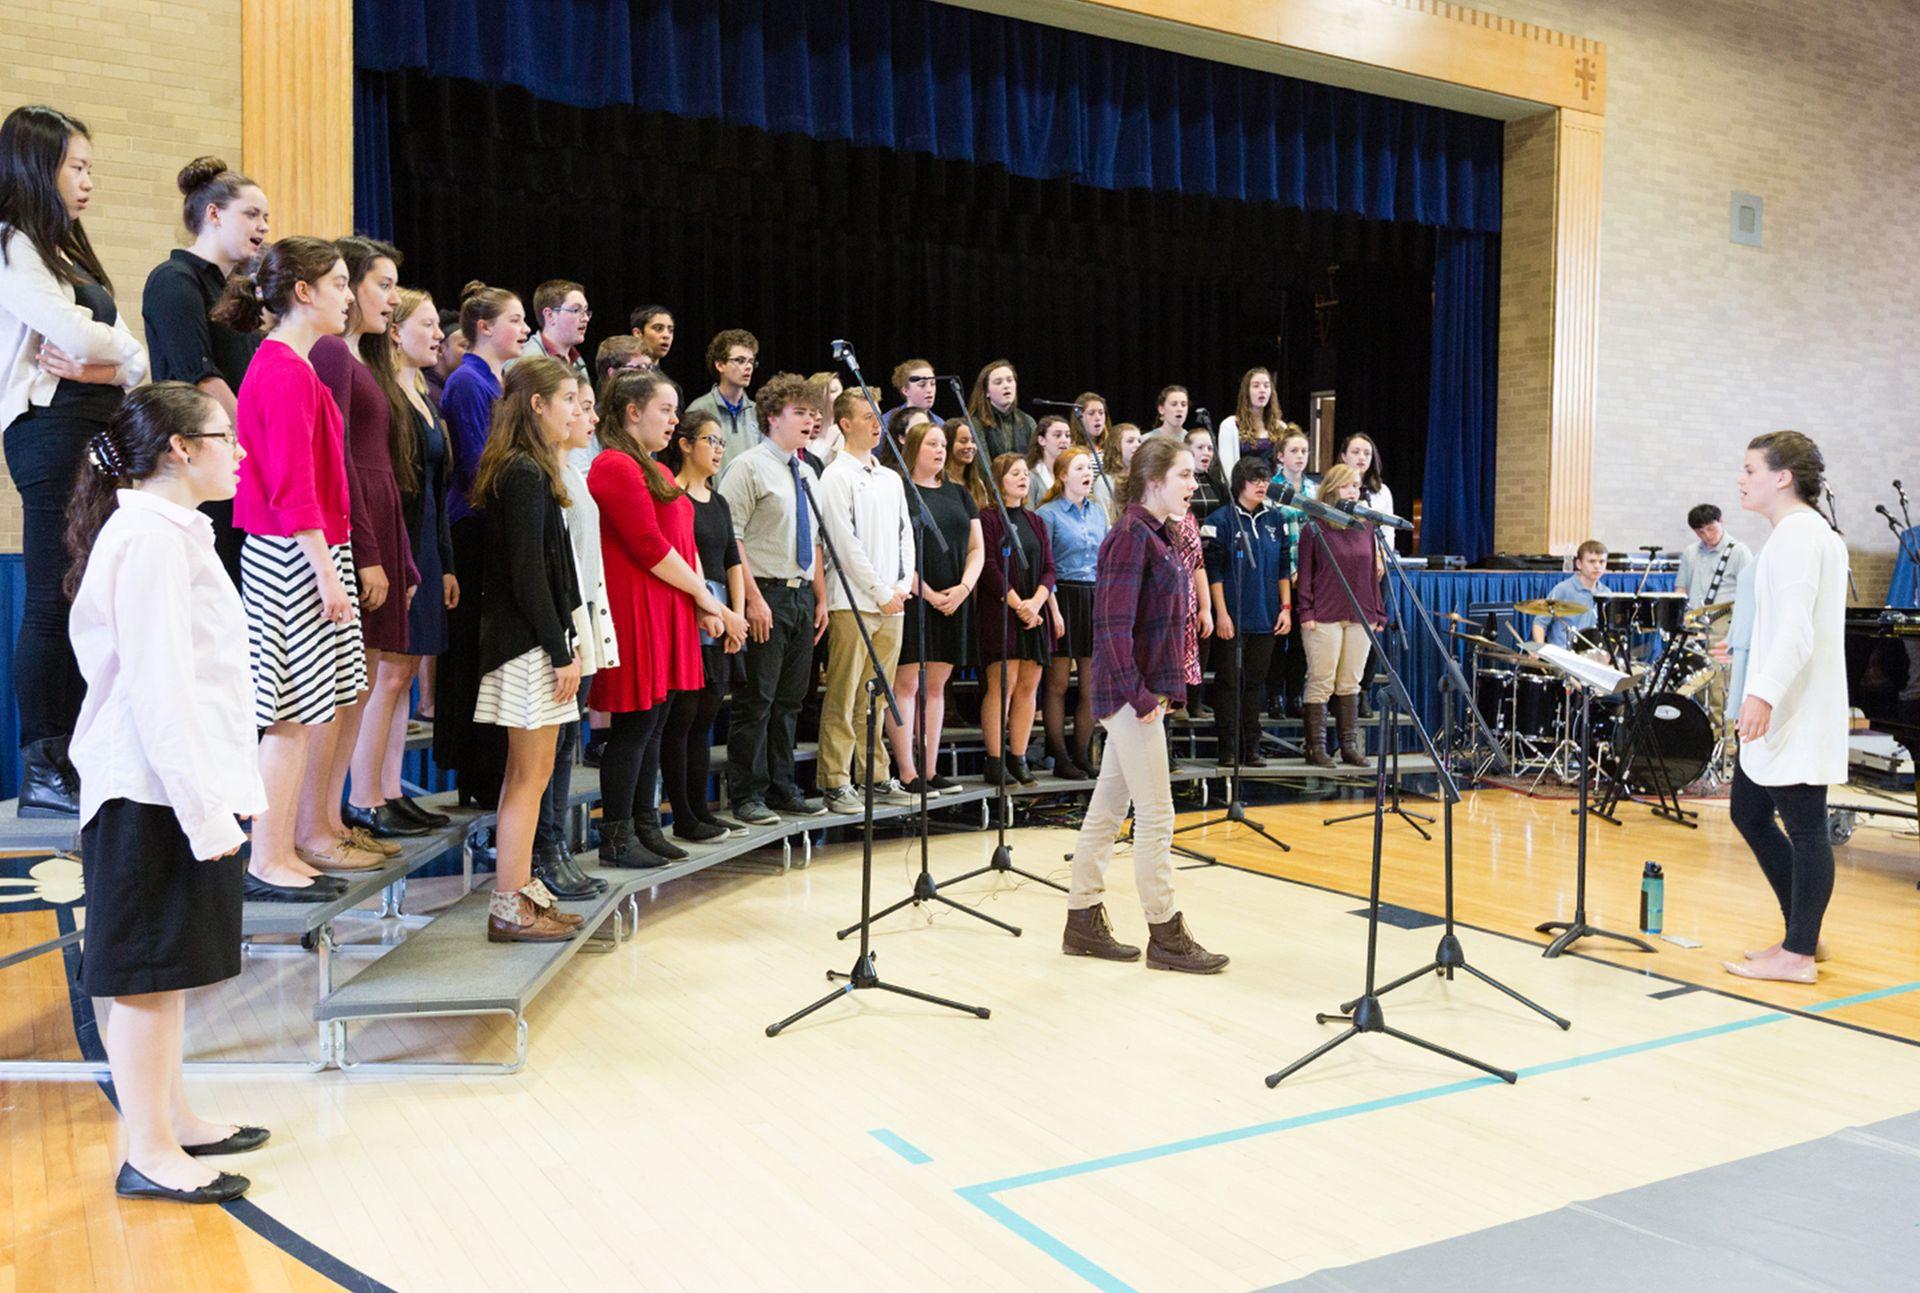 St. Thomas Aquinas High School